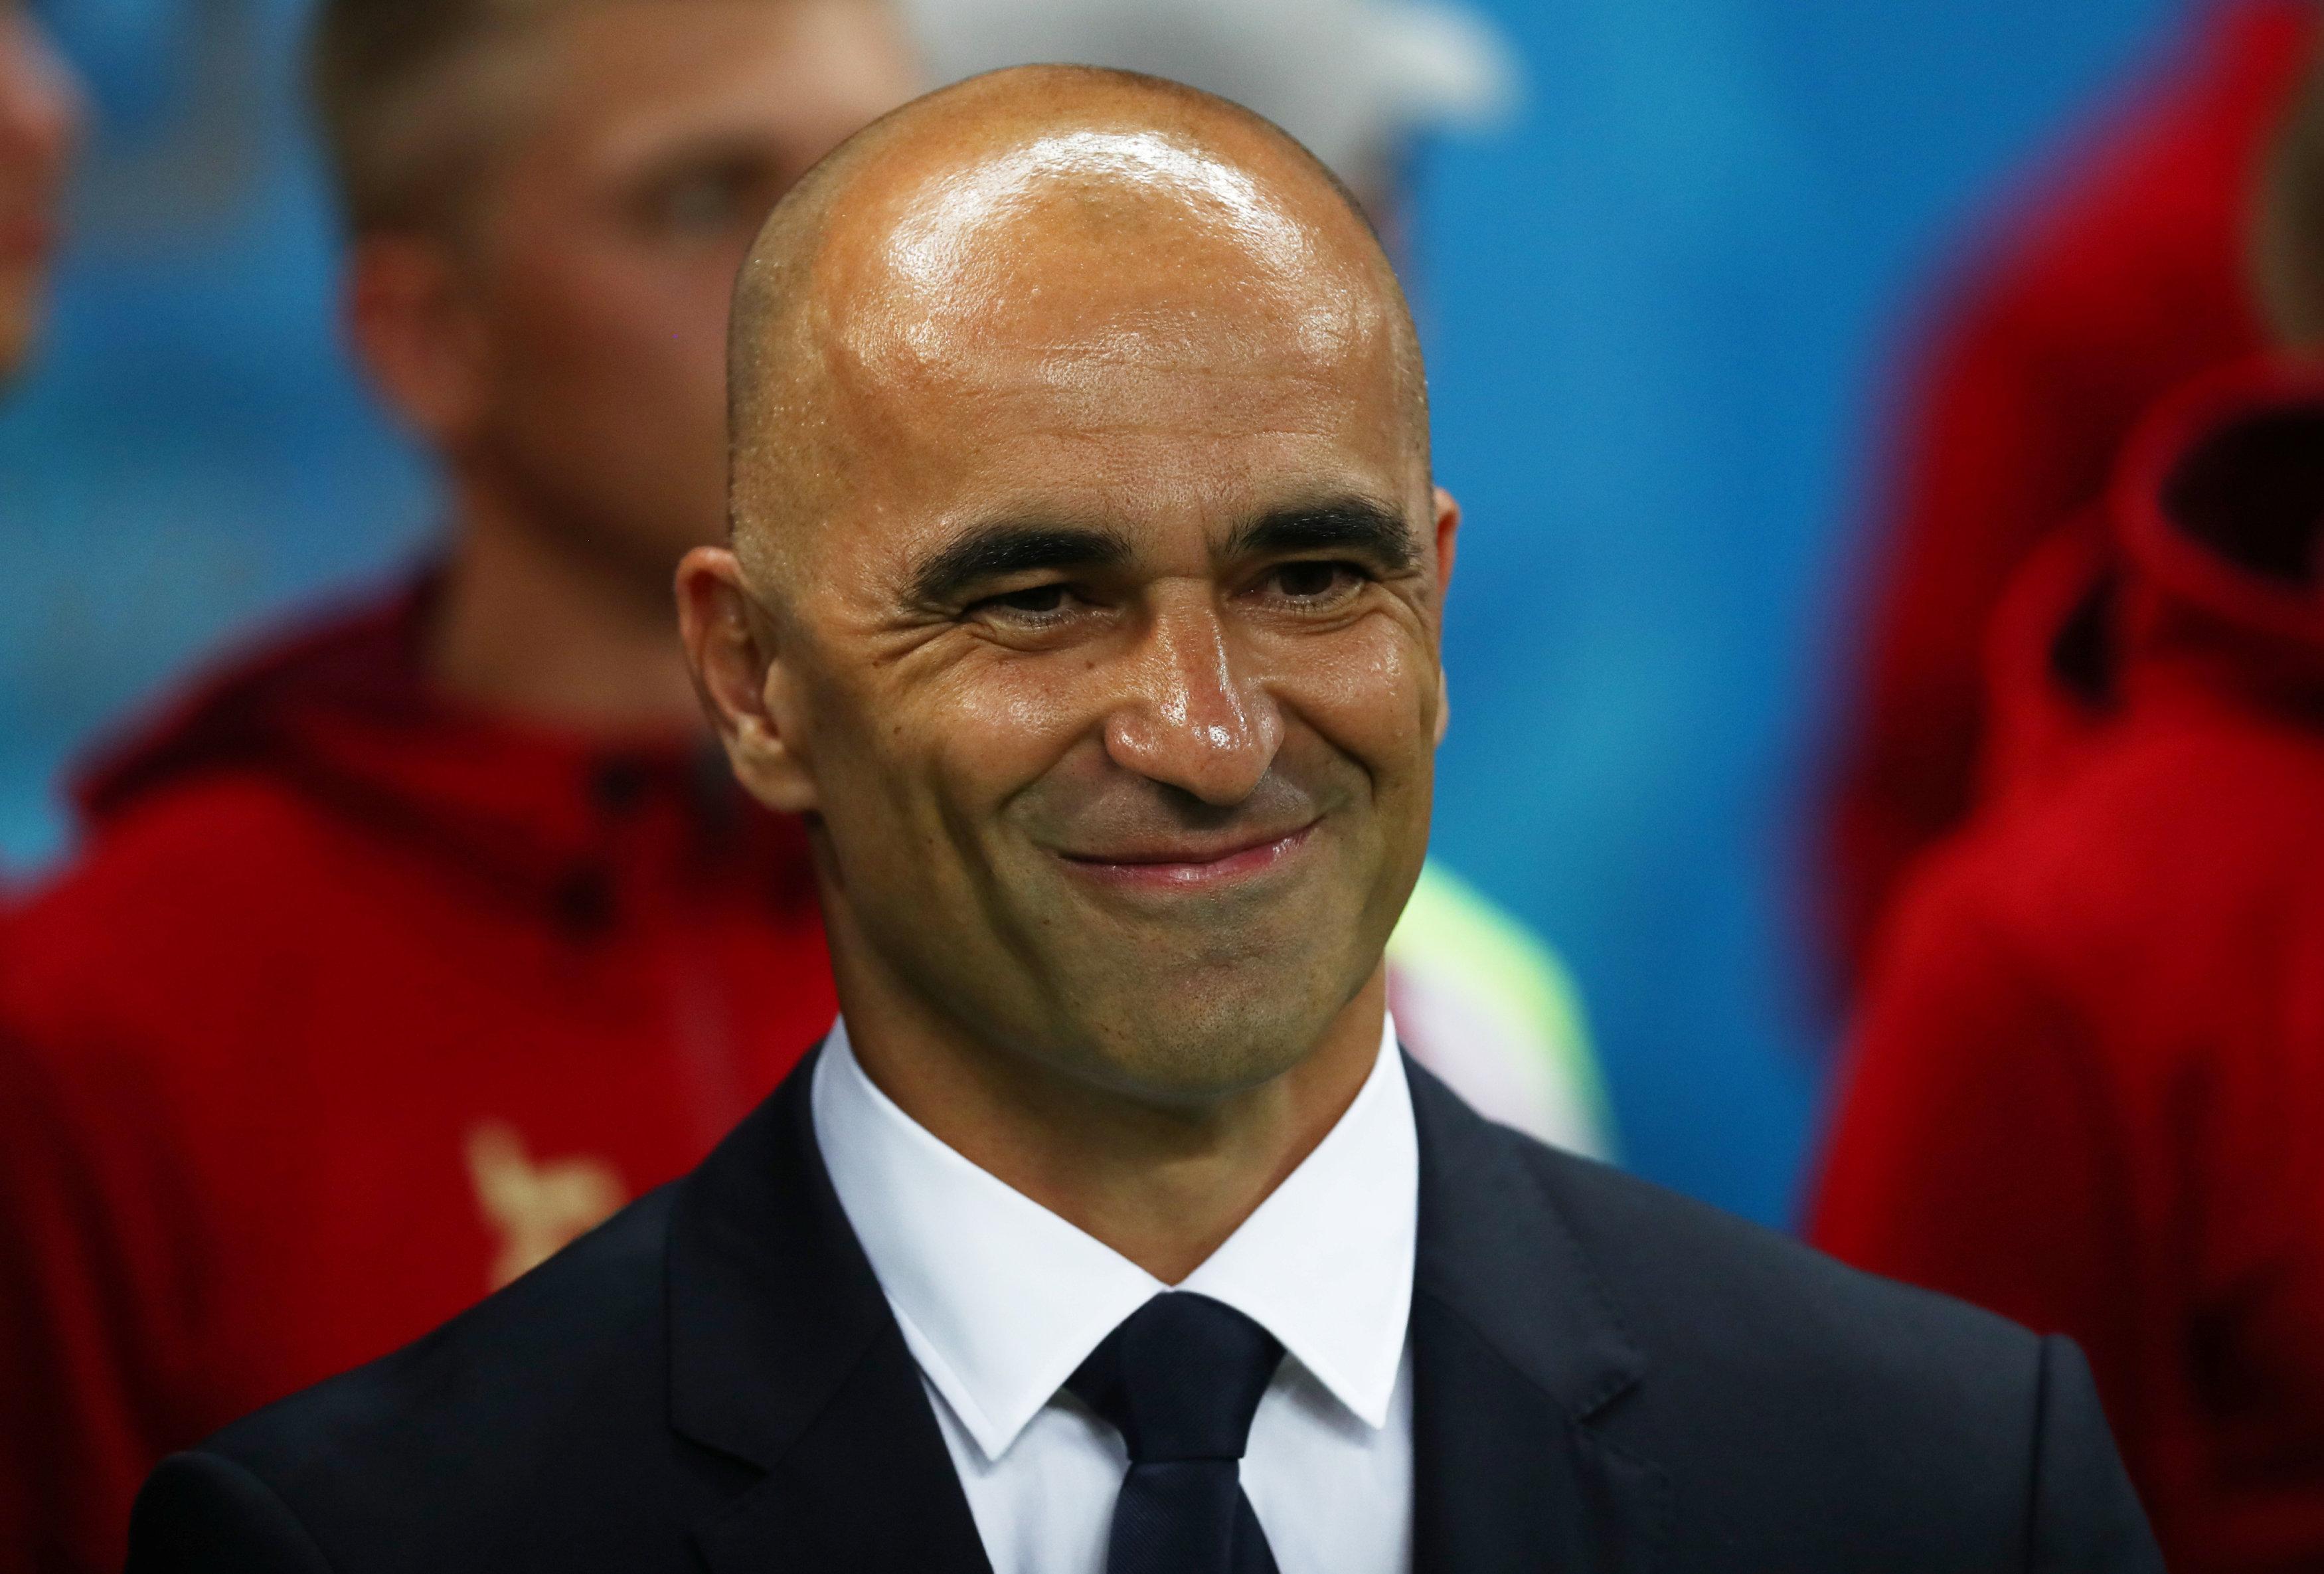 Soccer Football - World Cup - Quarter Final - Brazil vs Belgium - Kazan Arena, Kazan, Russia - July 6, 2018  Belgium coach Roberto Martinez before the match. Photo: REUTERS